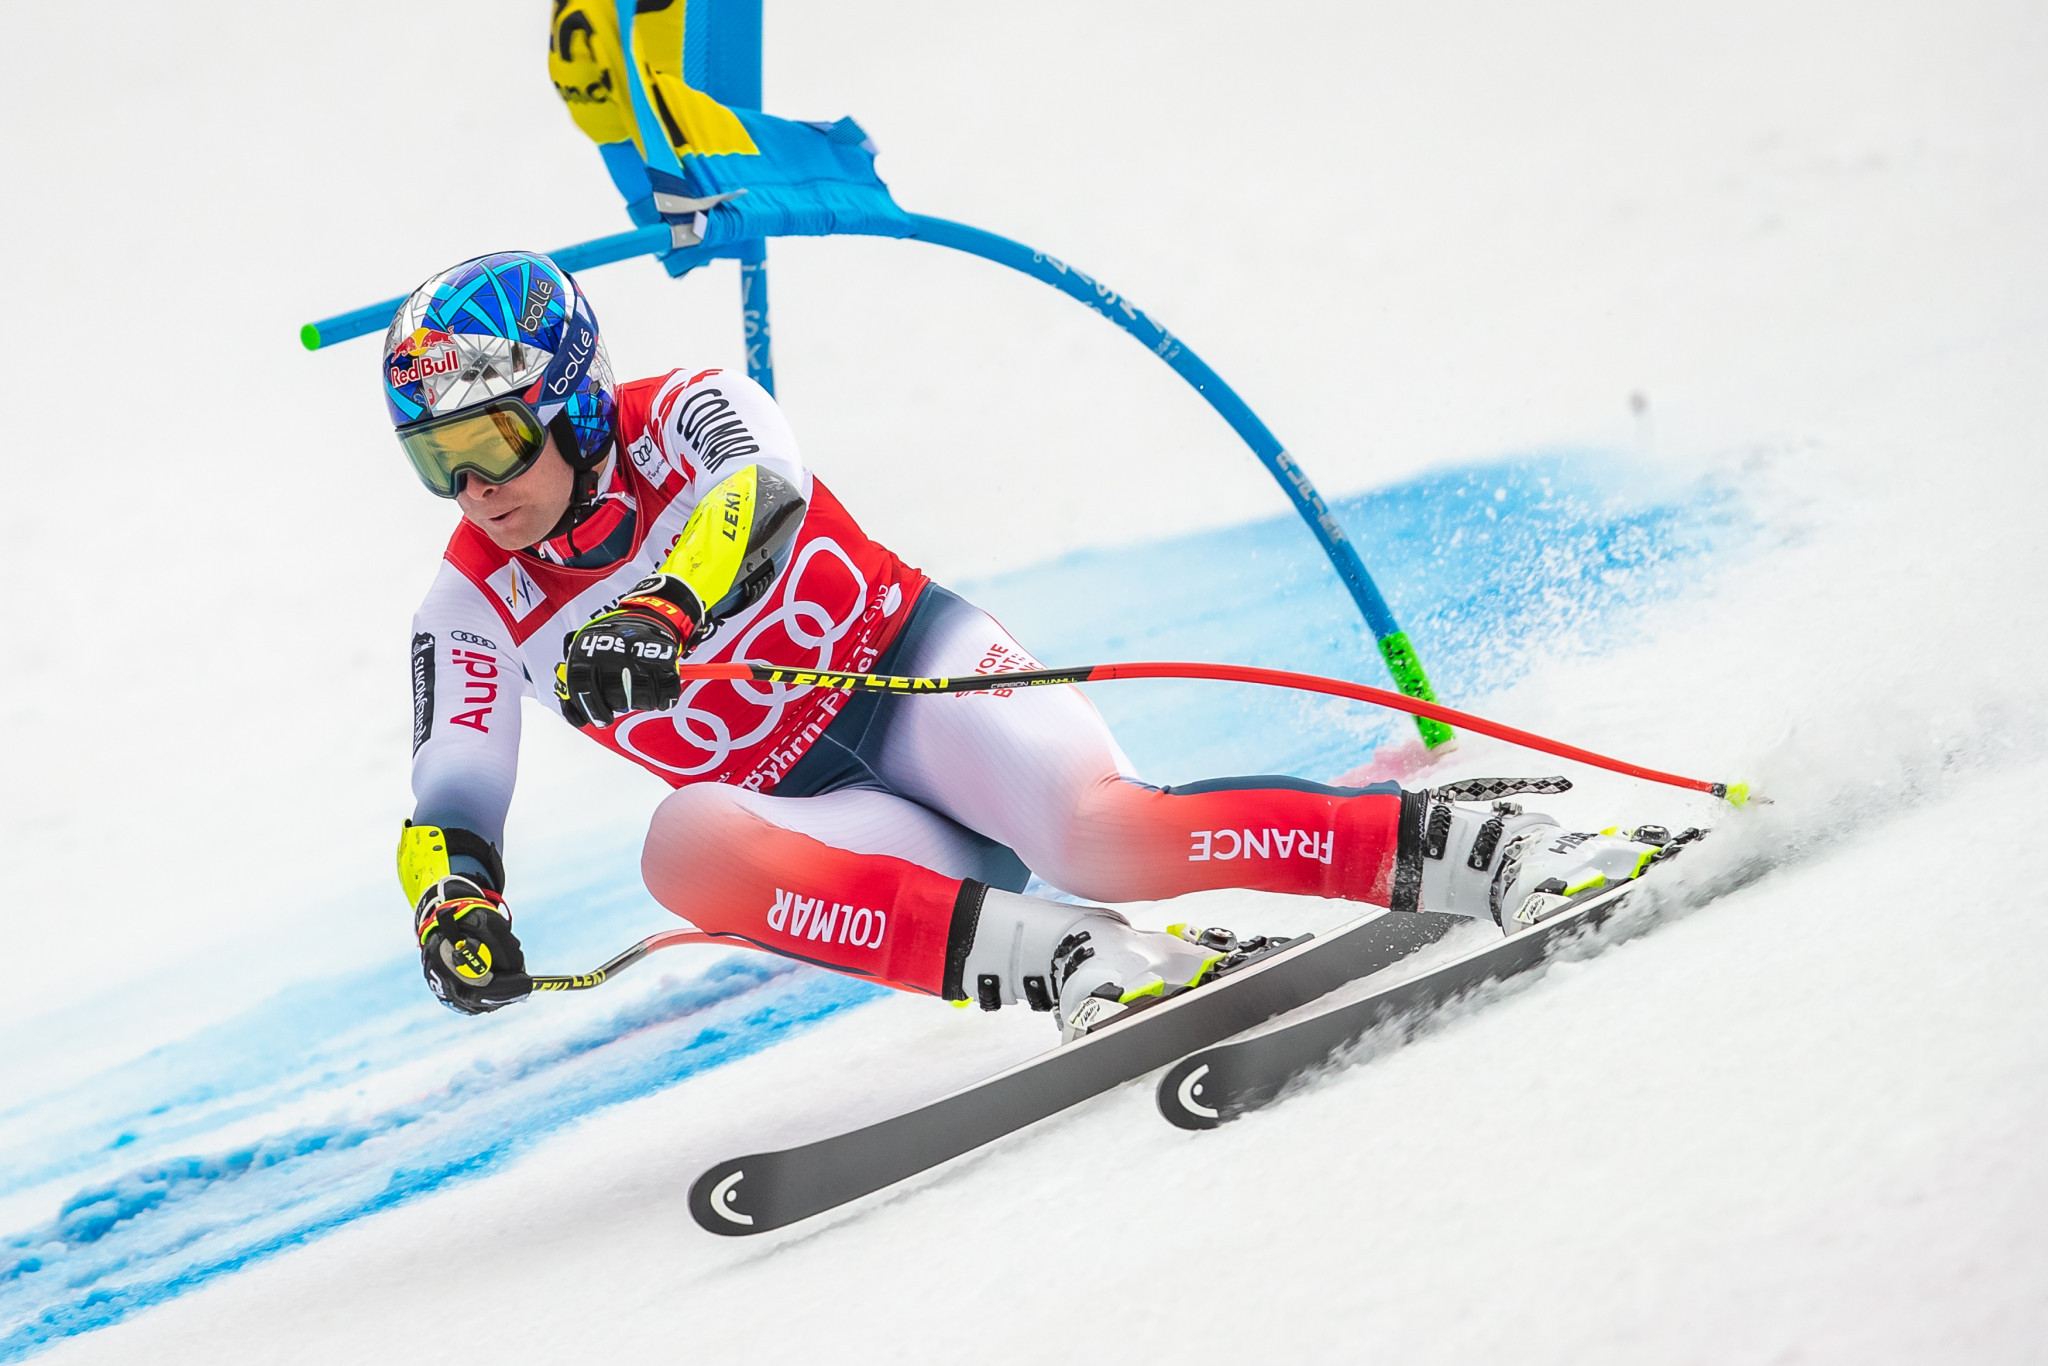 Fluorinated wax ban pushed back to 2021-2022 FIS season